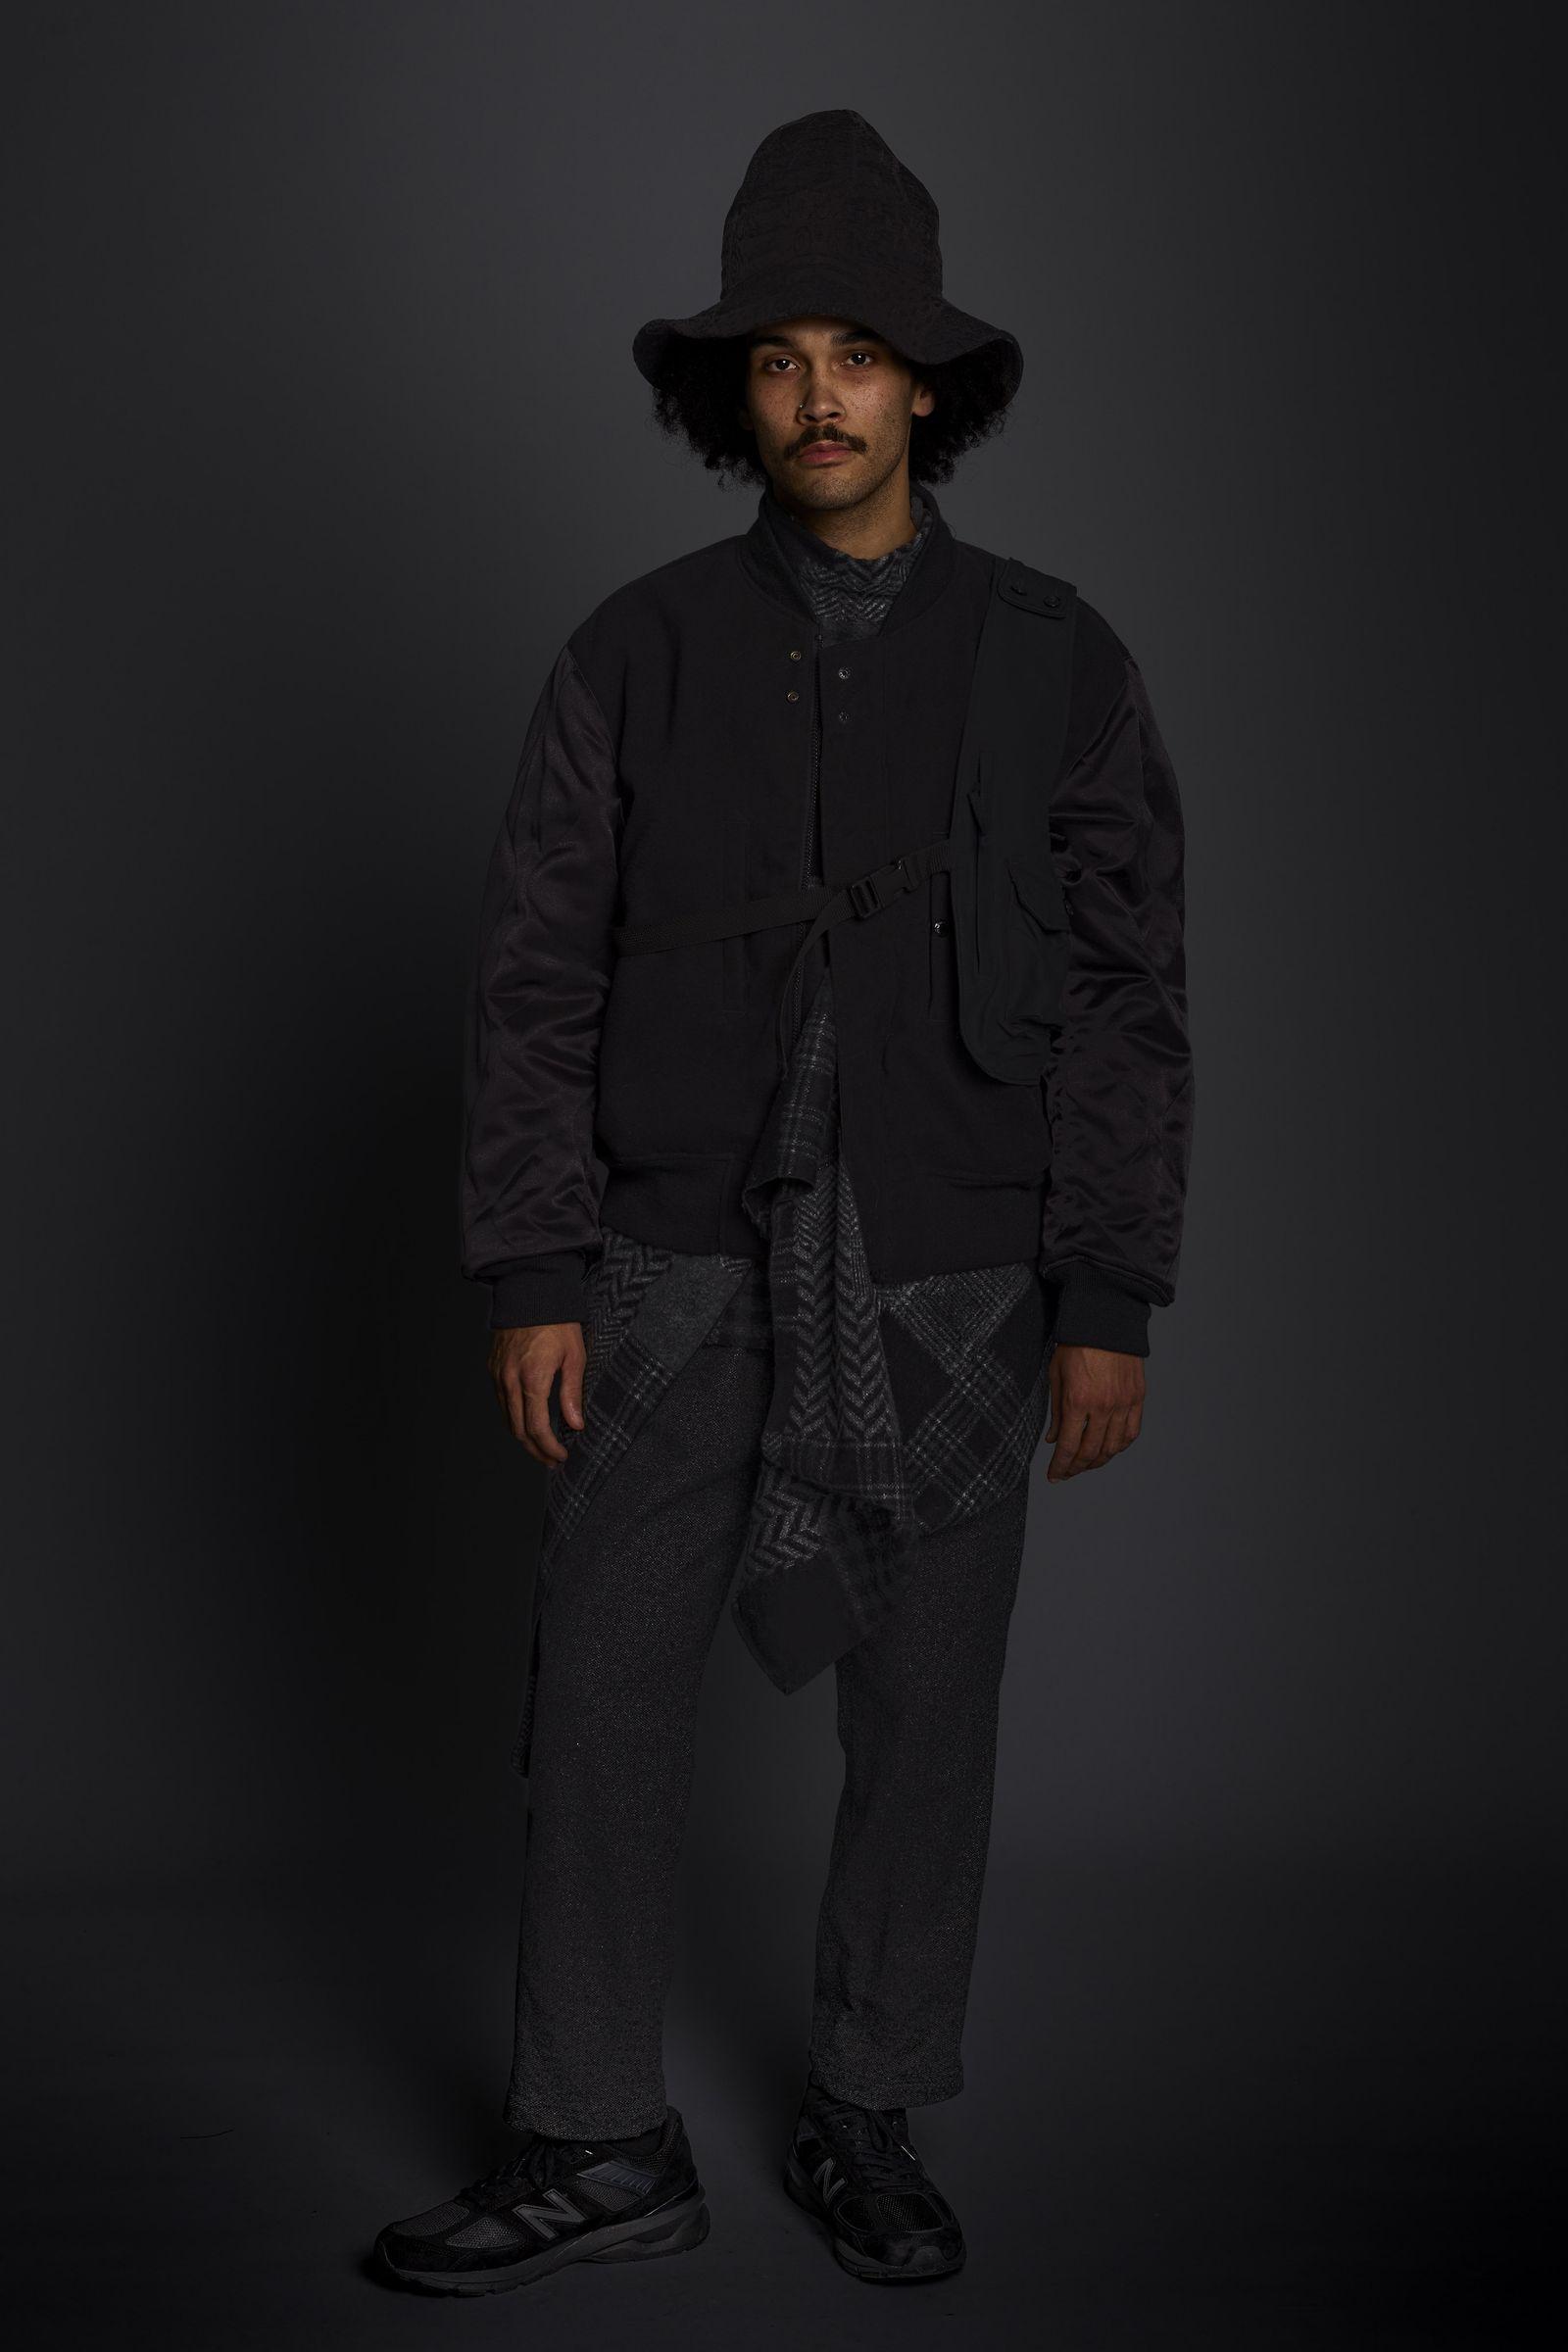 engineered-garments-fall-winter-2020-28